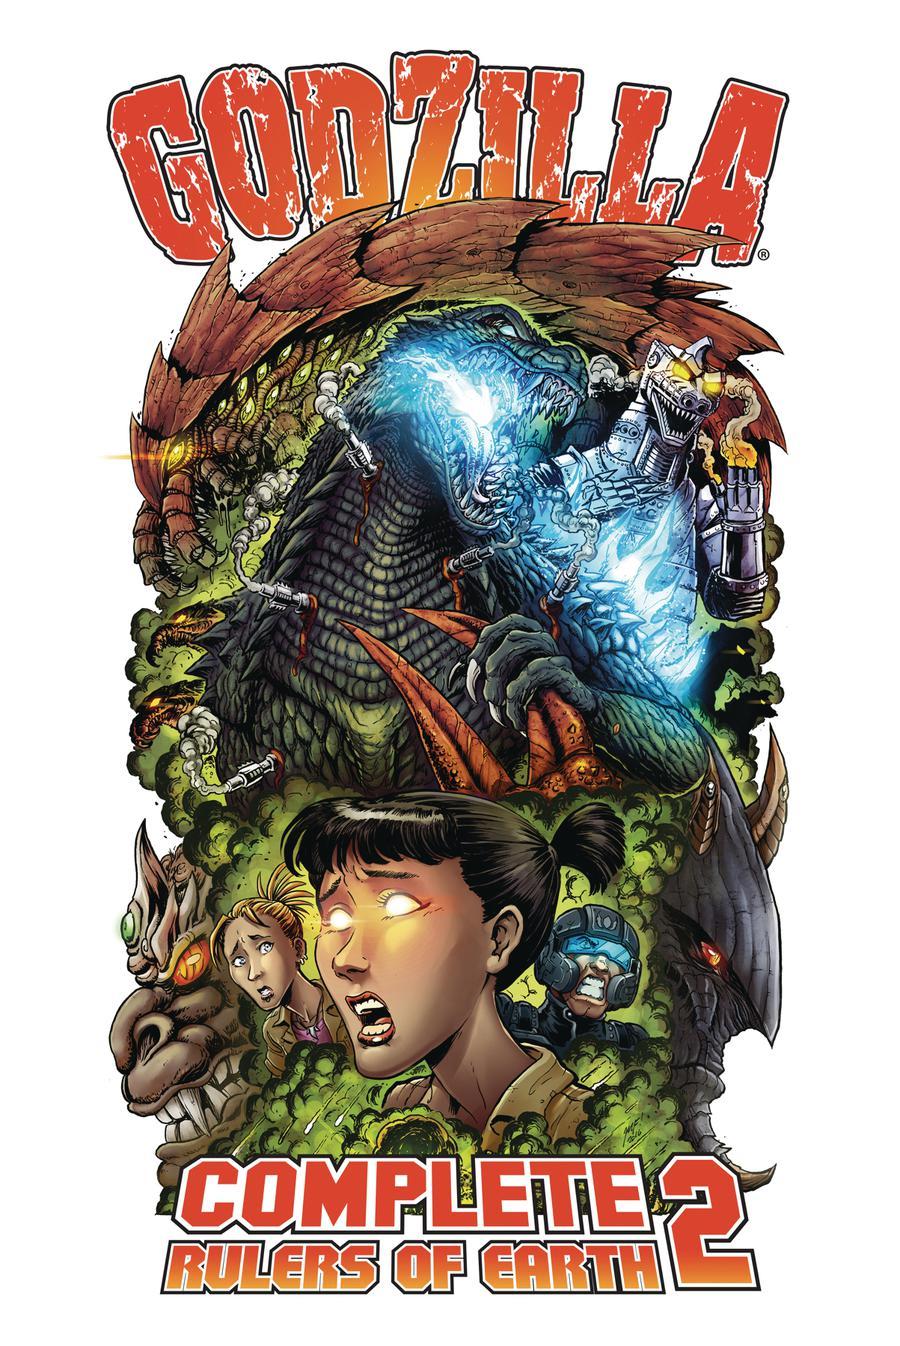 Godzilla Complete Rulers Of Earth Vol 2 TP